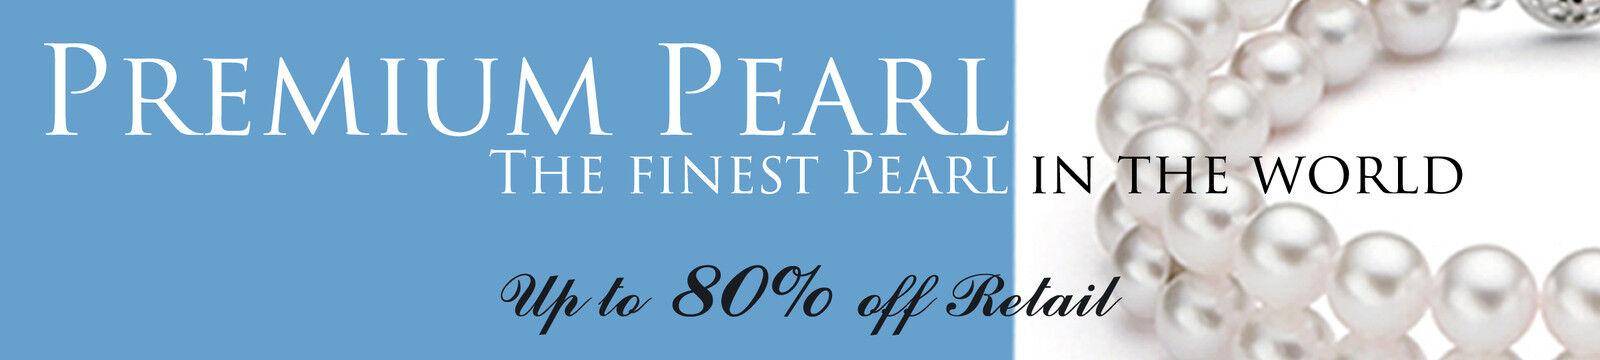 premium pearl